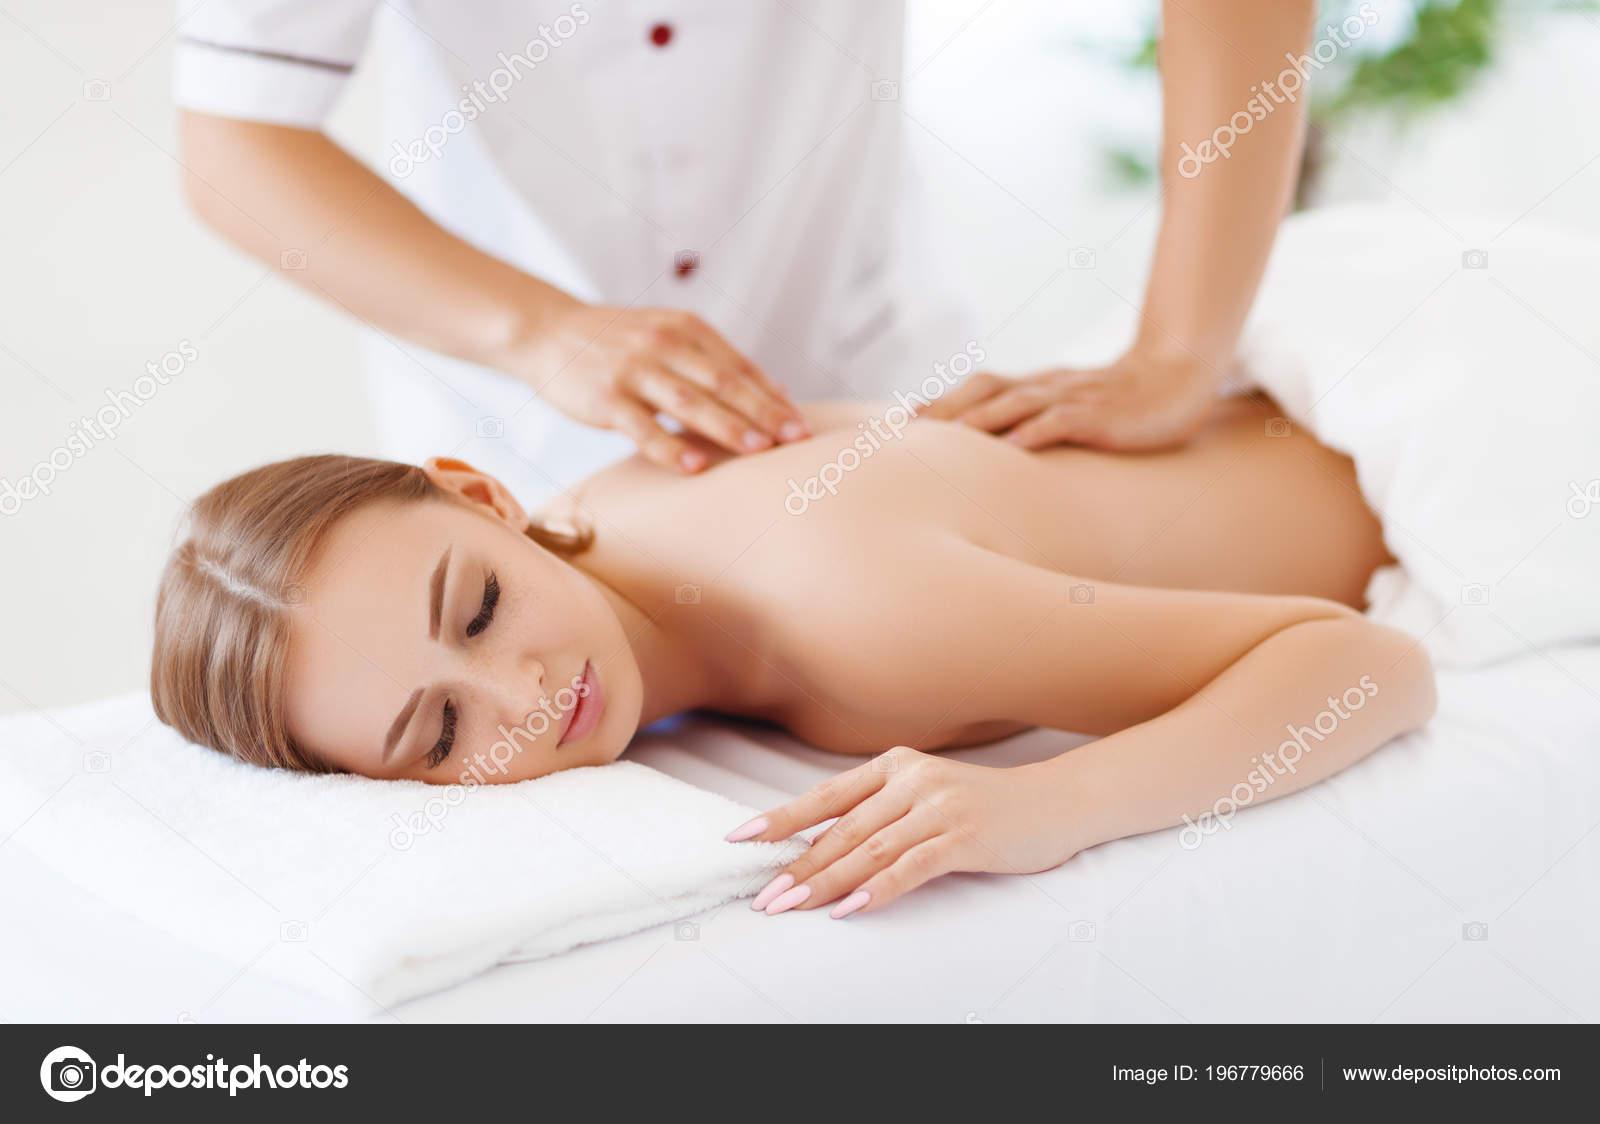 Массаж девушка картинки аренда салон эротического массажа